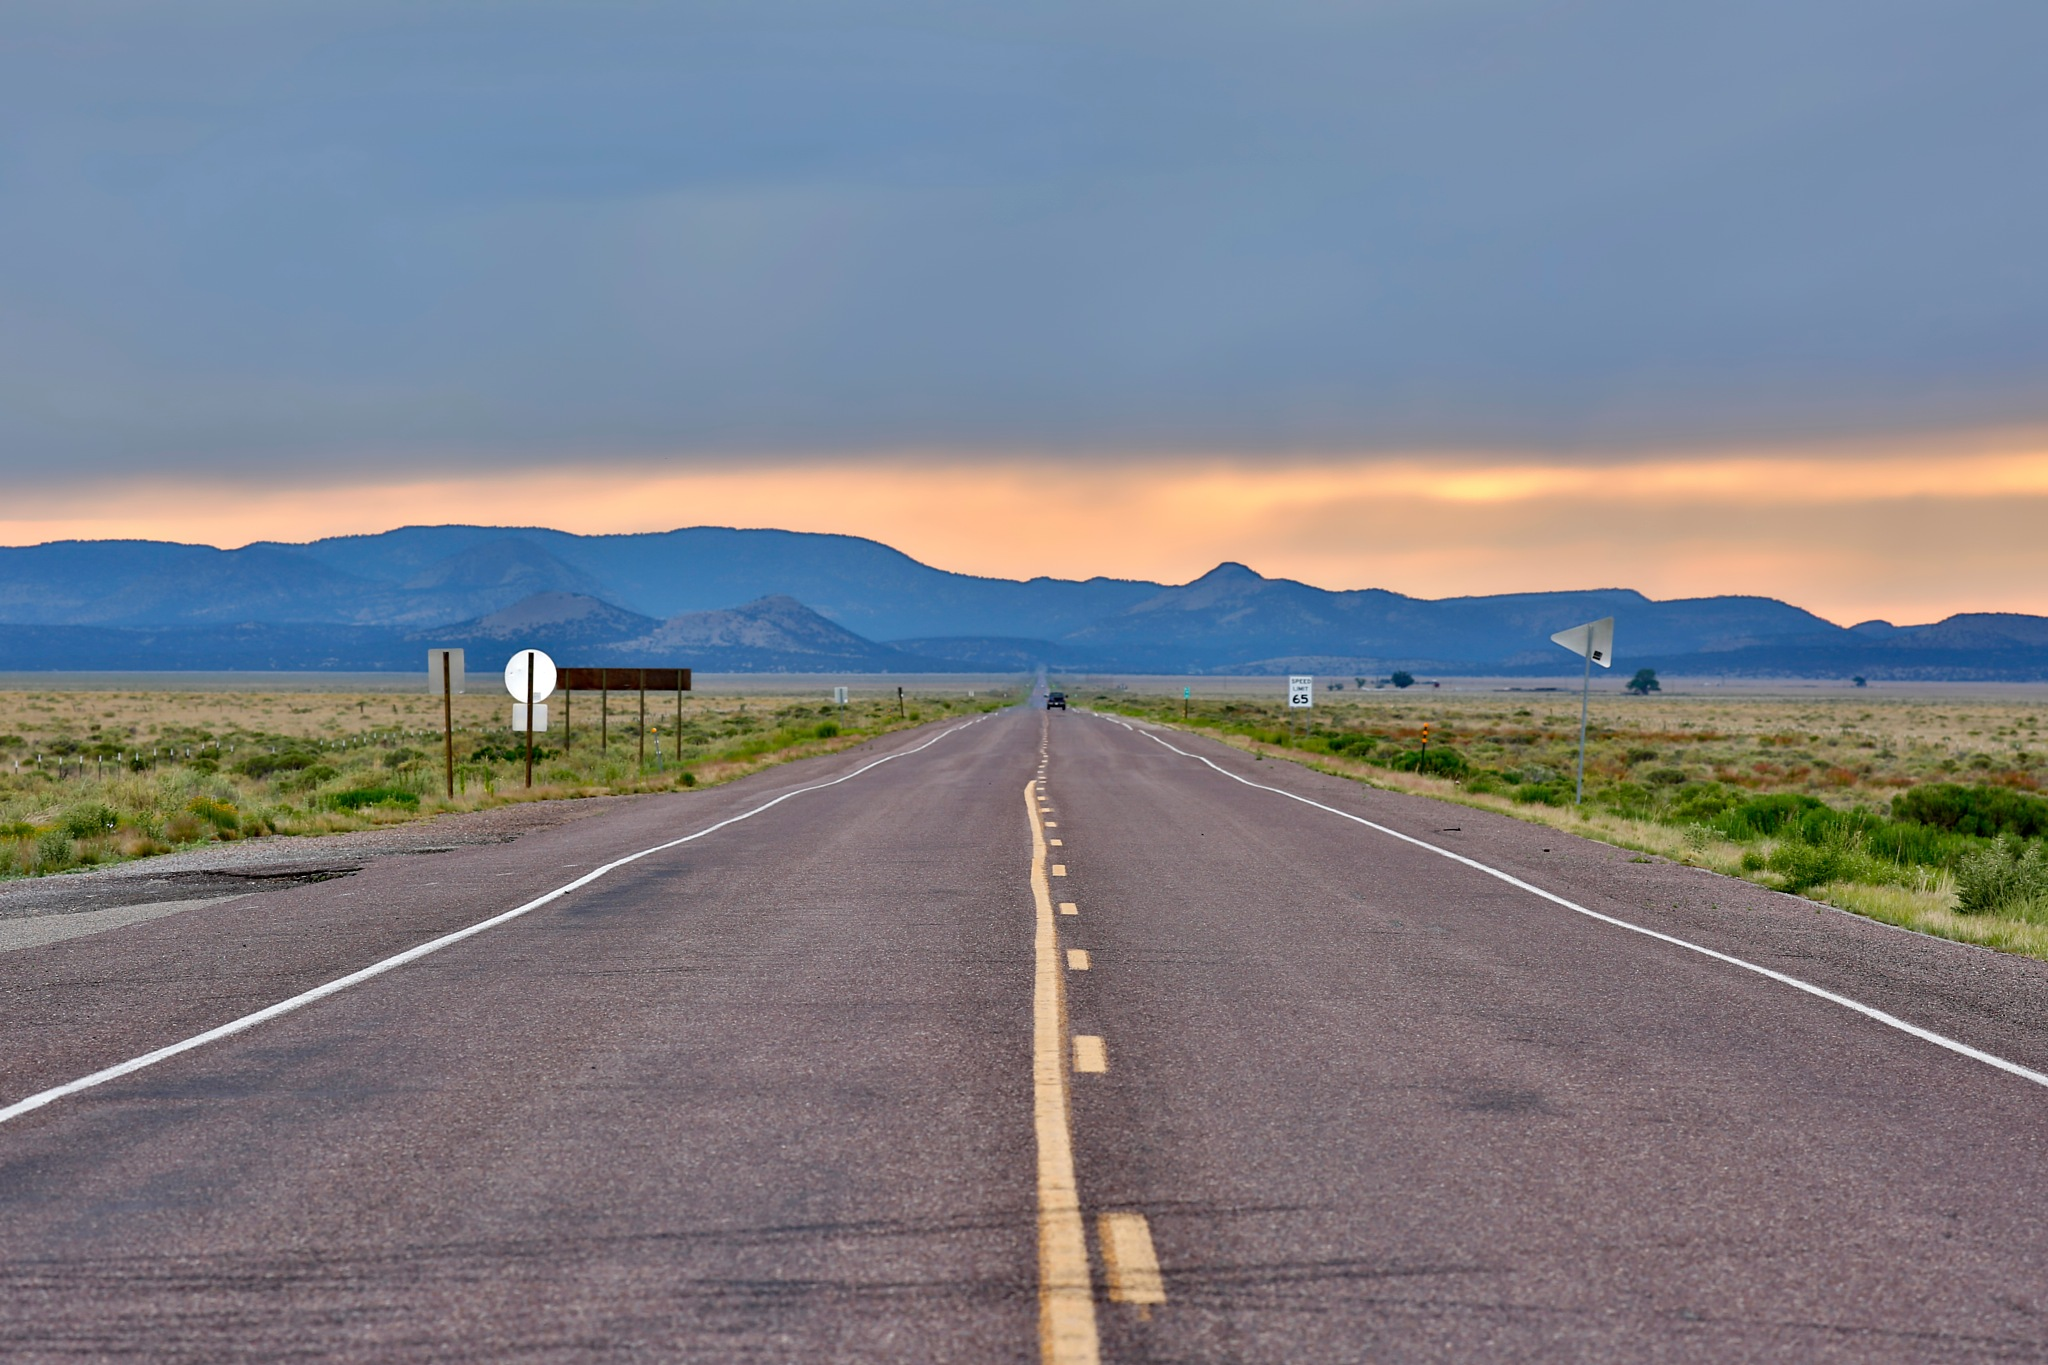 Sunset Road by visbimmer79